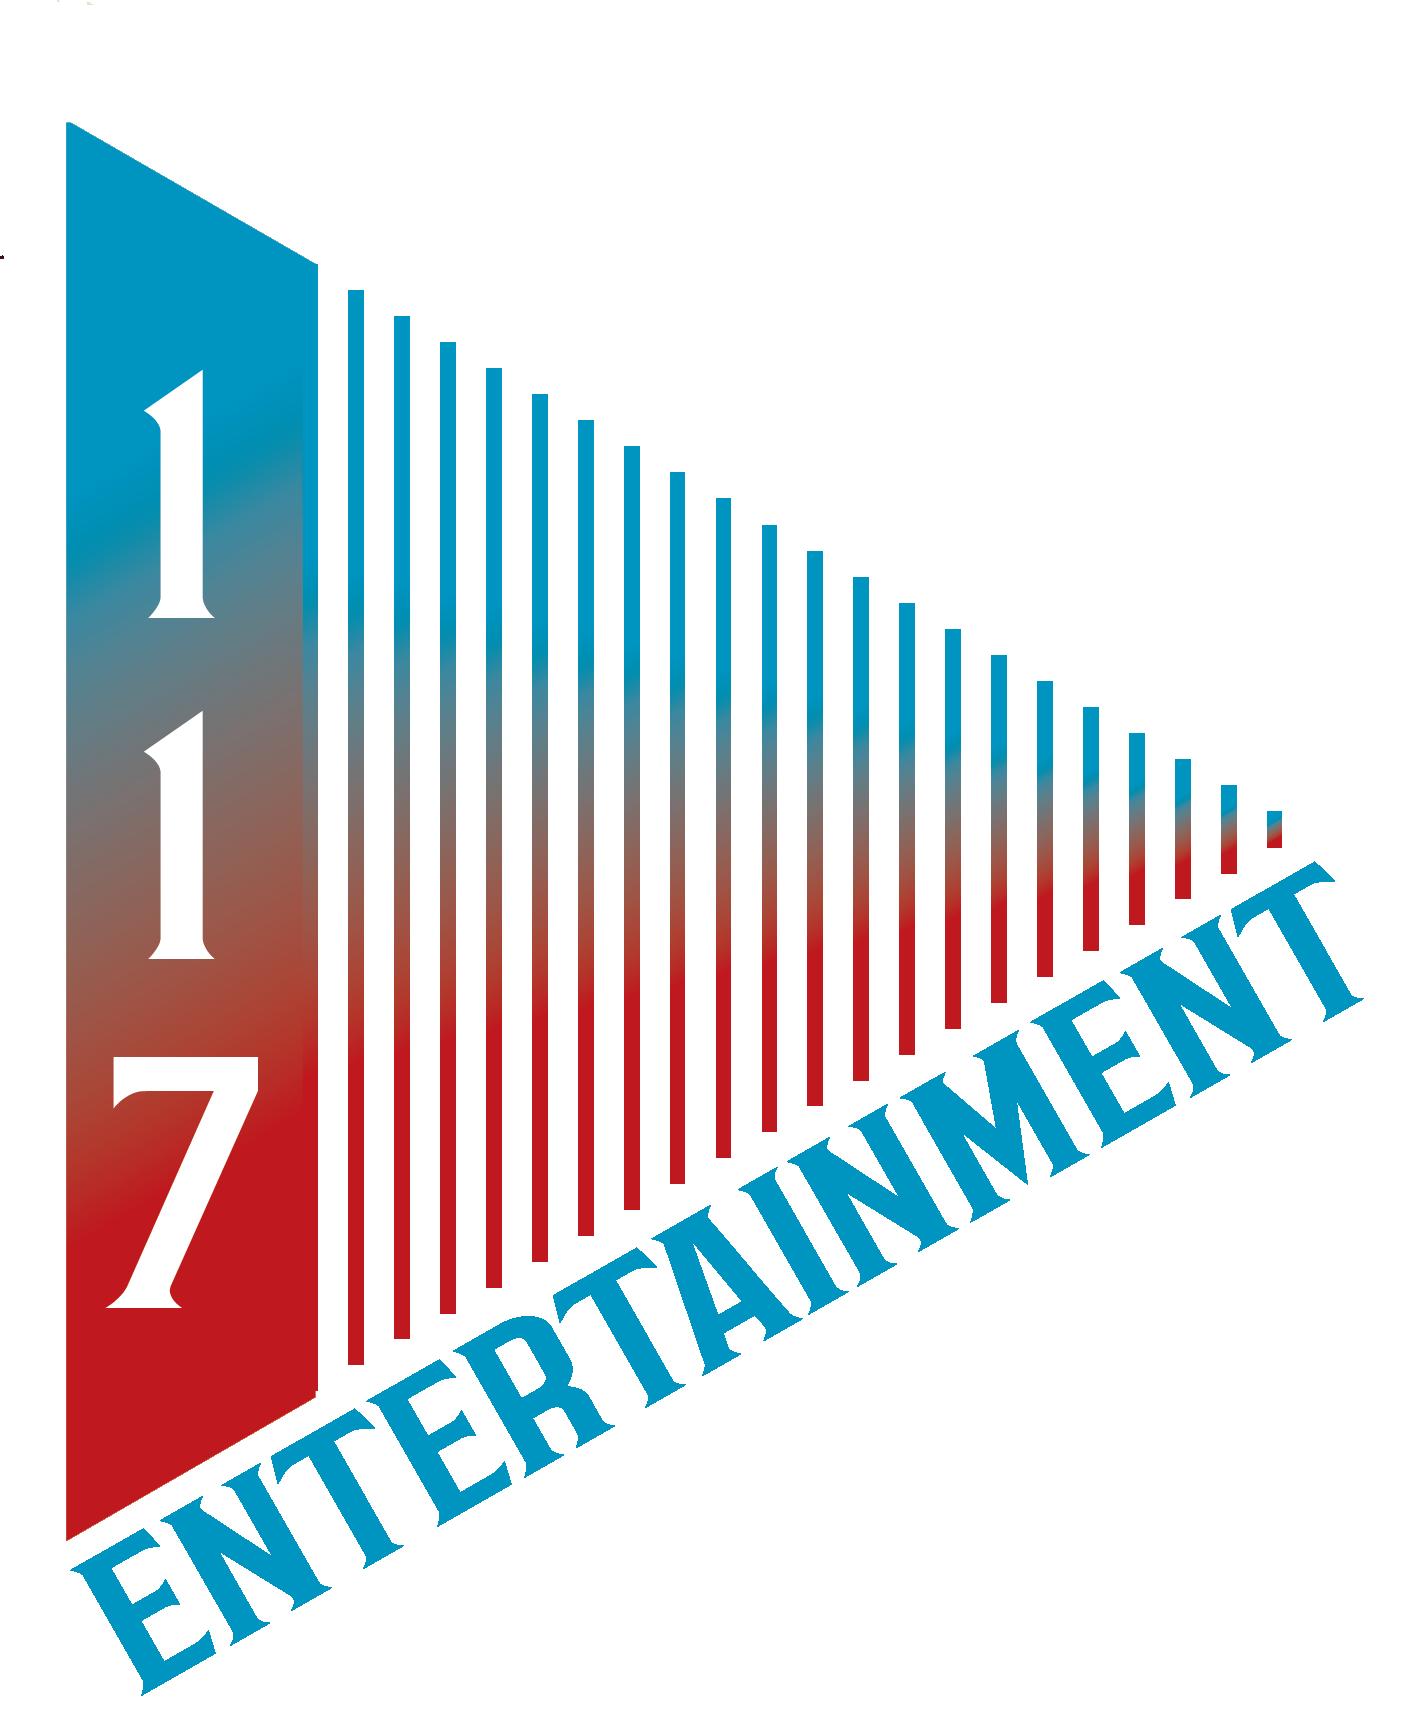 117 Entertainment